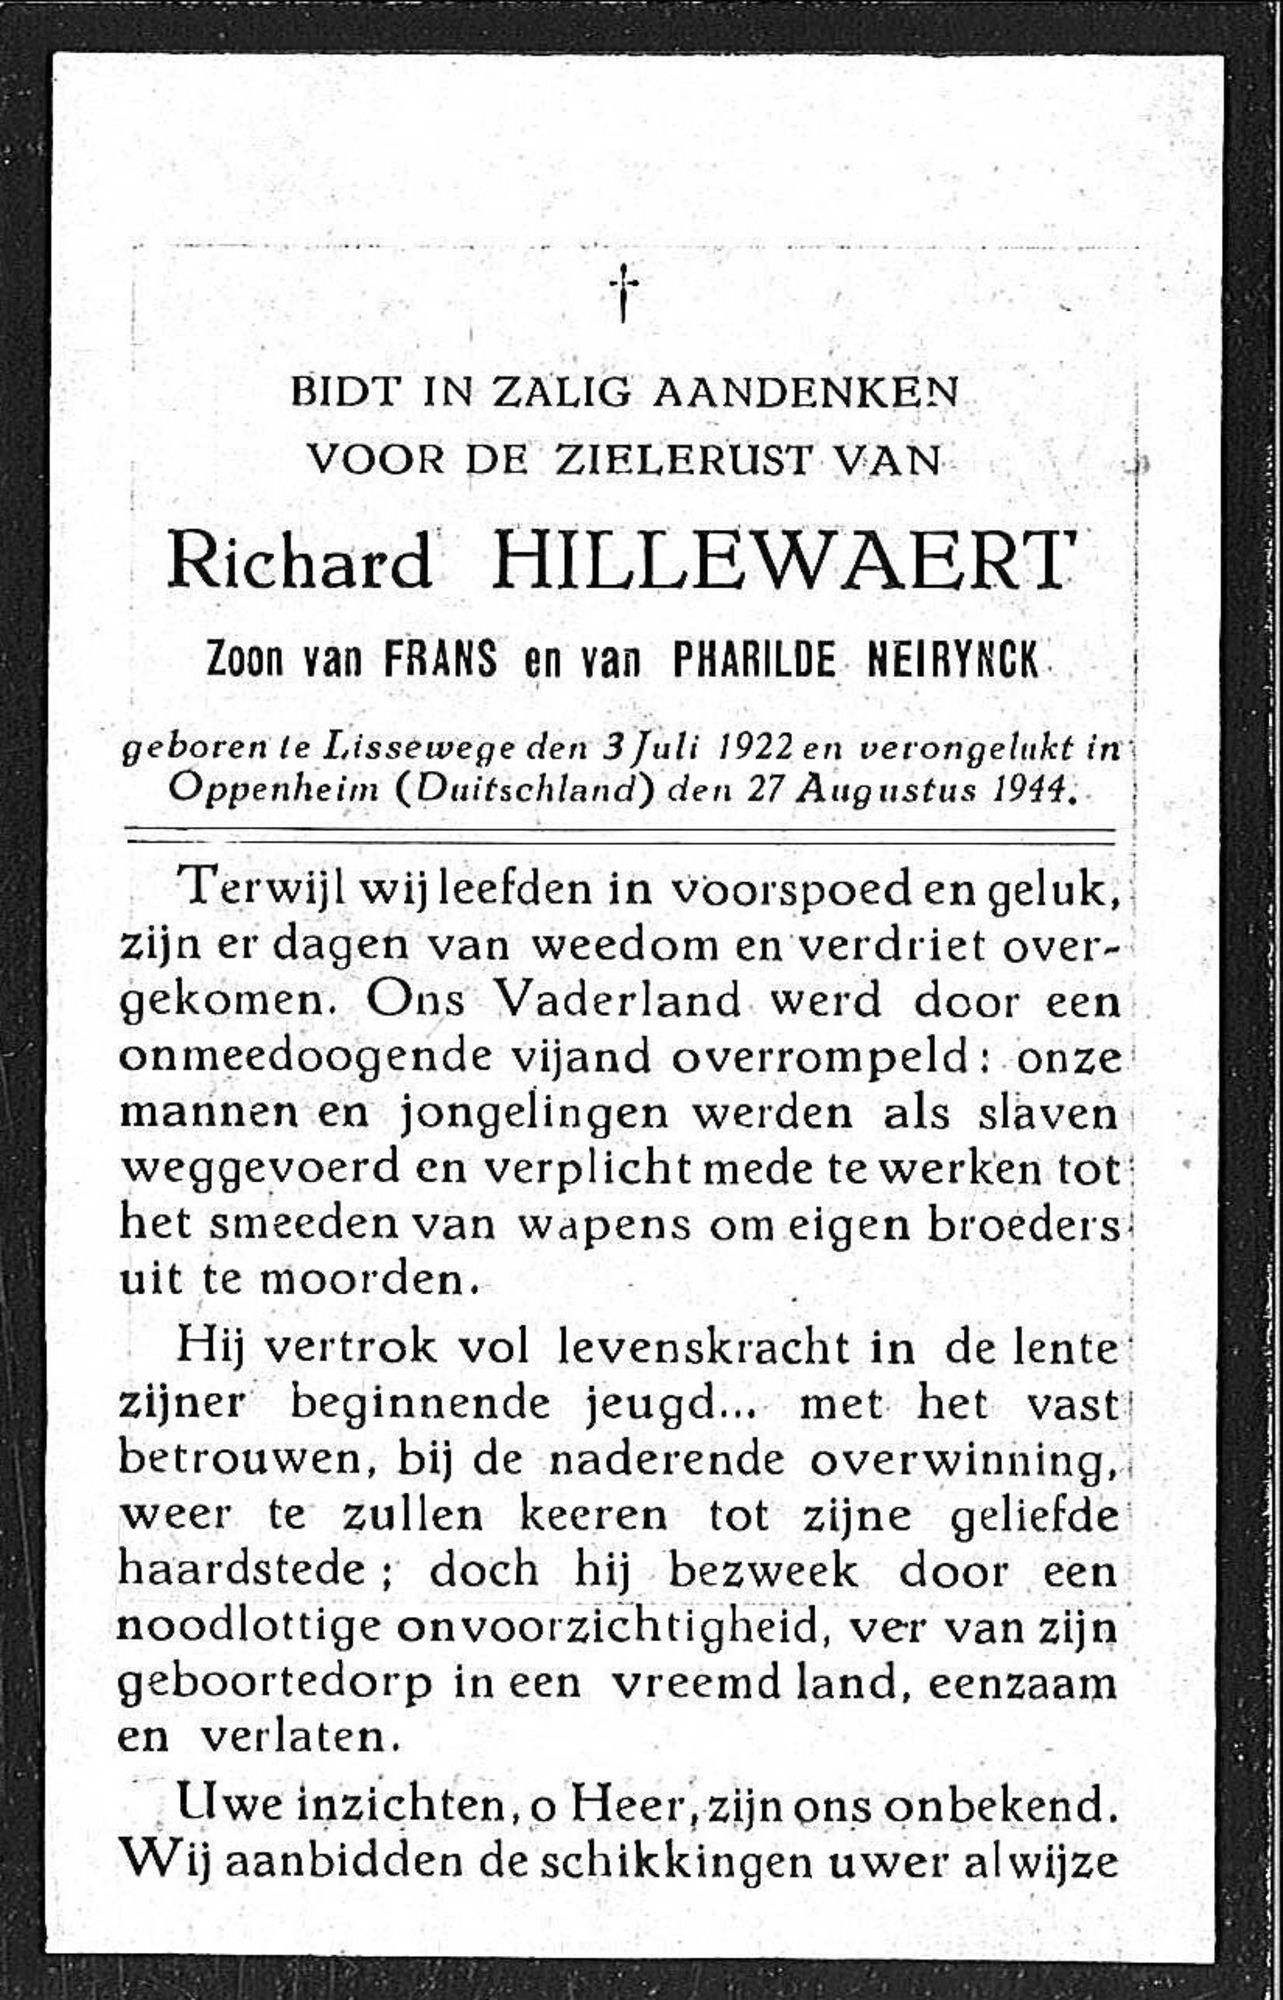 Richard Hillewaert